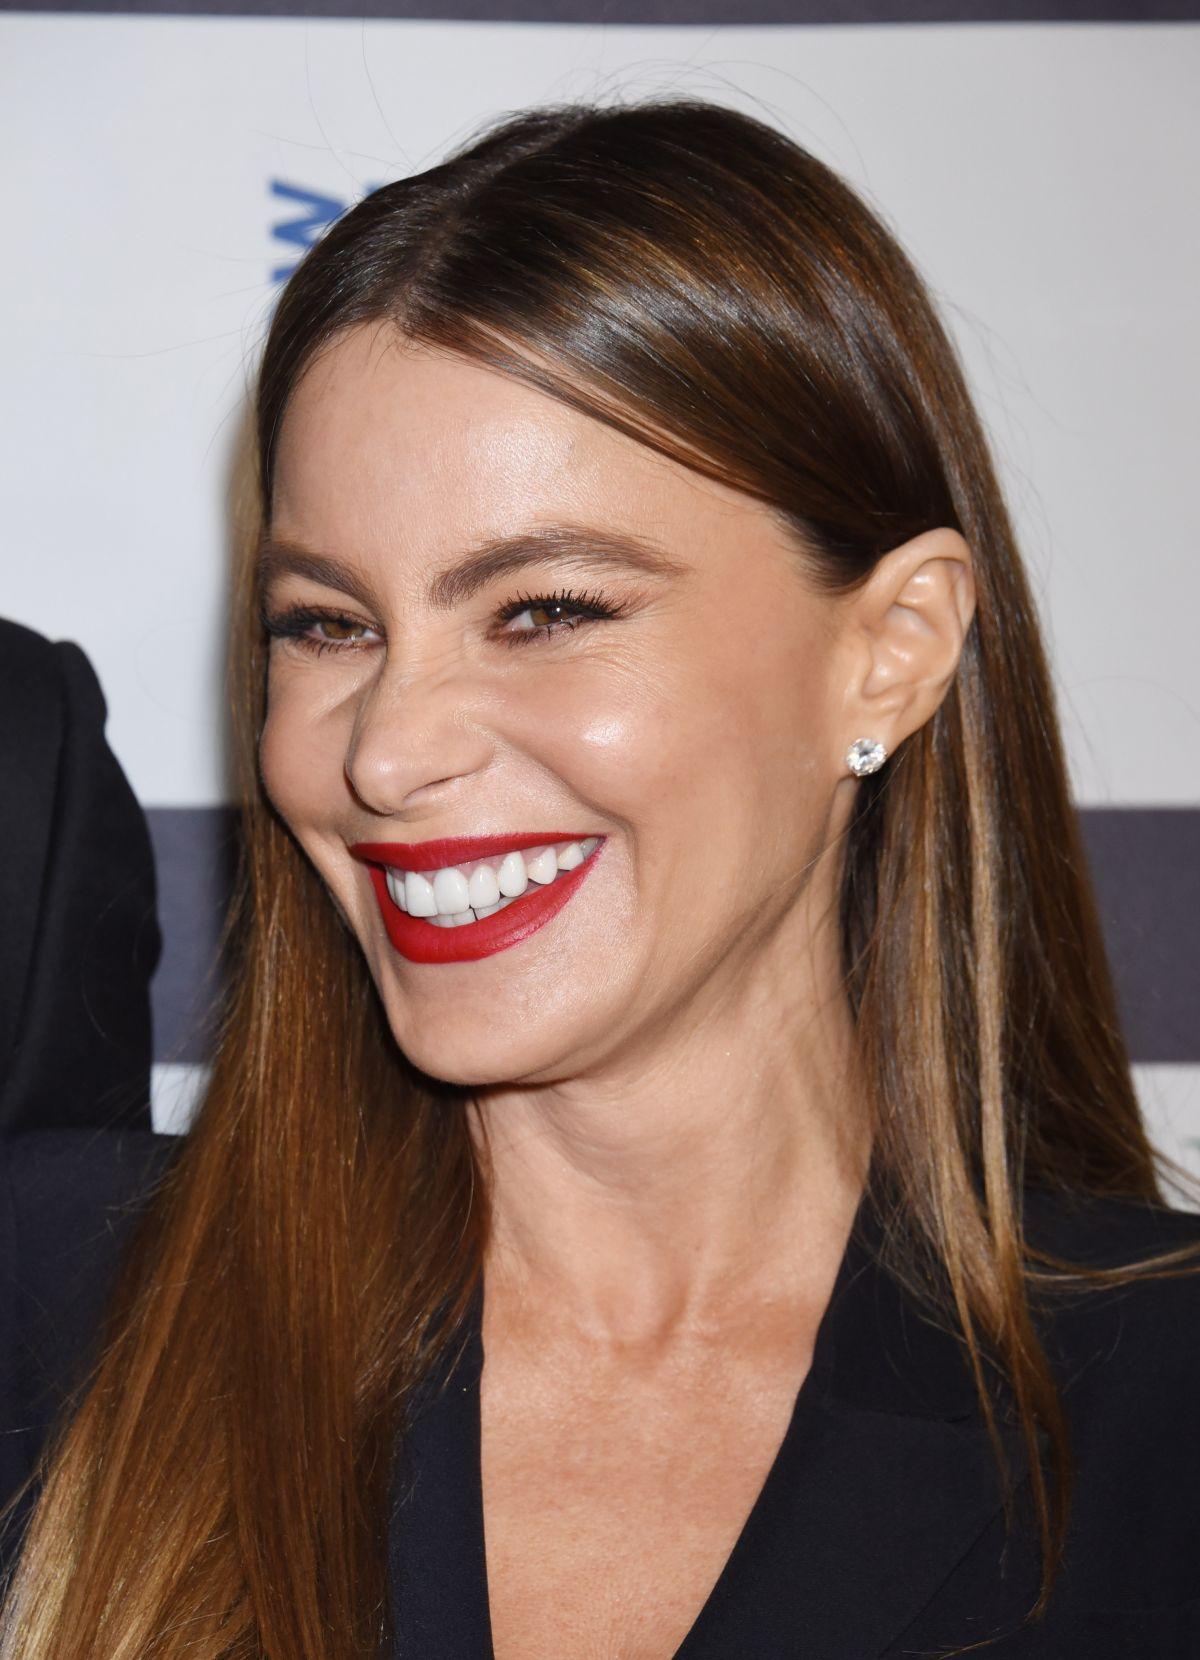 SOFIA VERGARA At Los Angeles Italia Film Fashion And Art